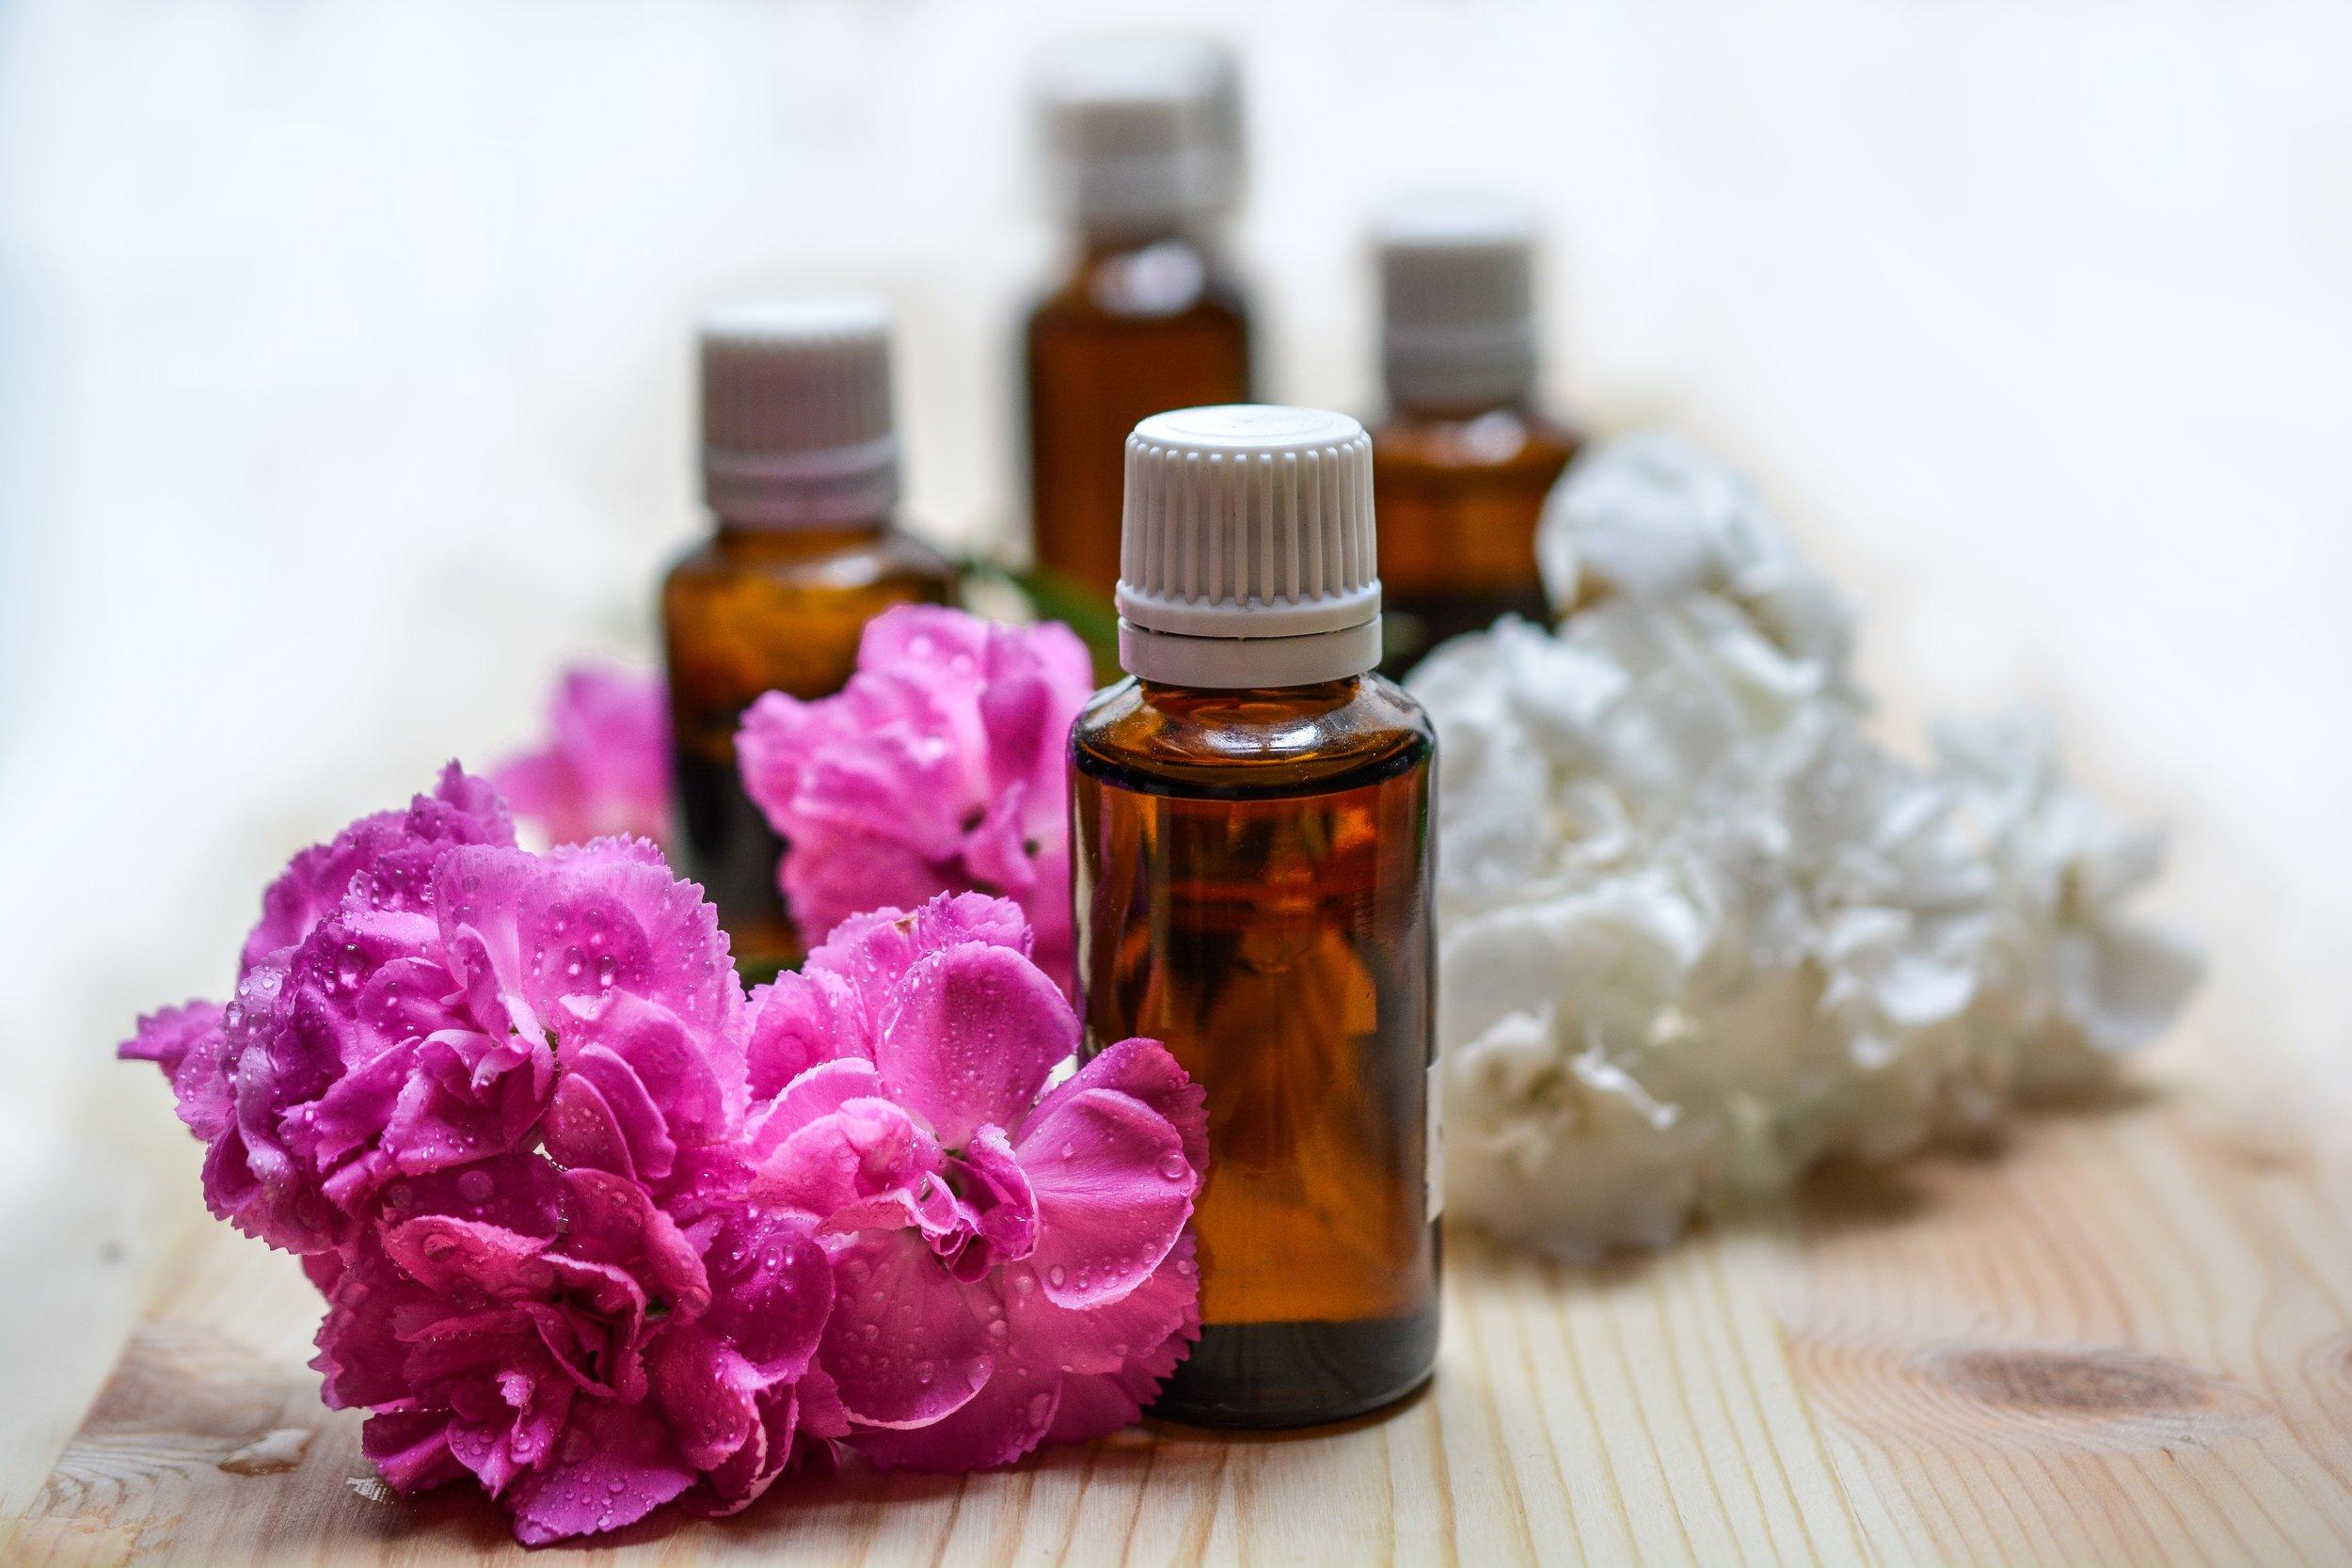 uwm.flower.essence.liquid-flower-petal-aroma-food-relax-611730-pxhere.com